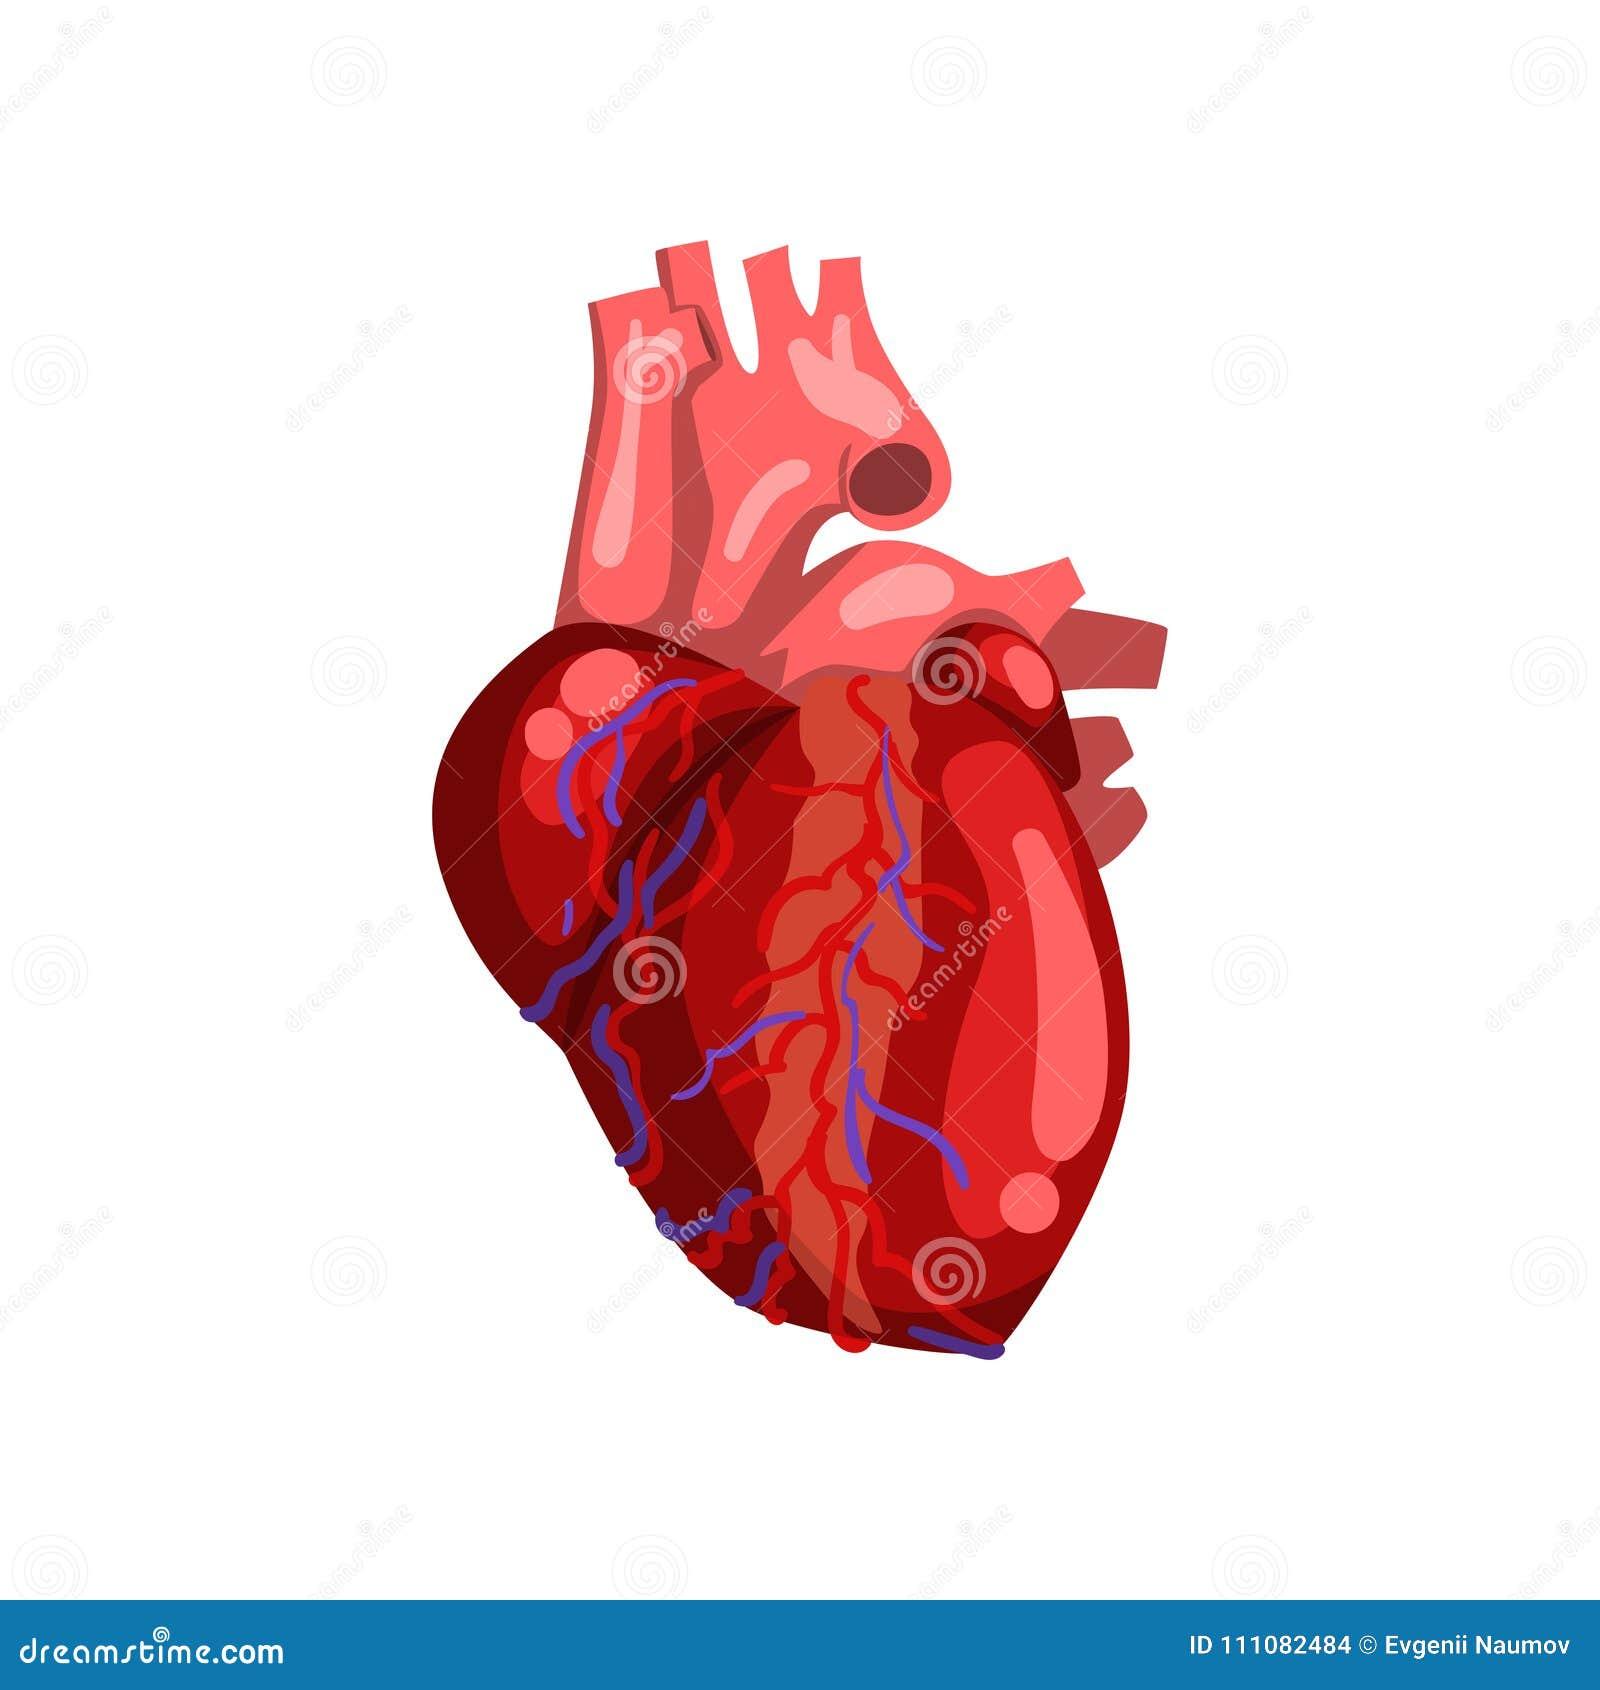 Human Heart Internal Organ Anatomy Vector Illustration On A White